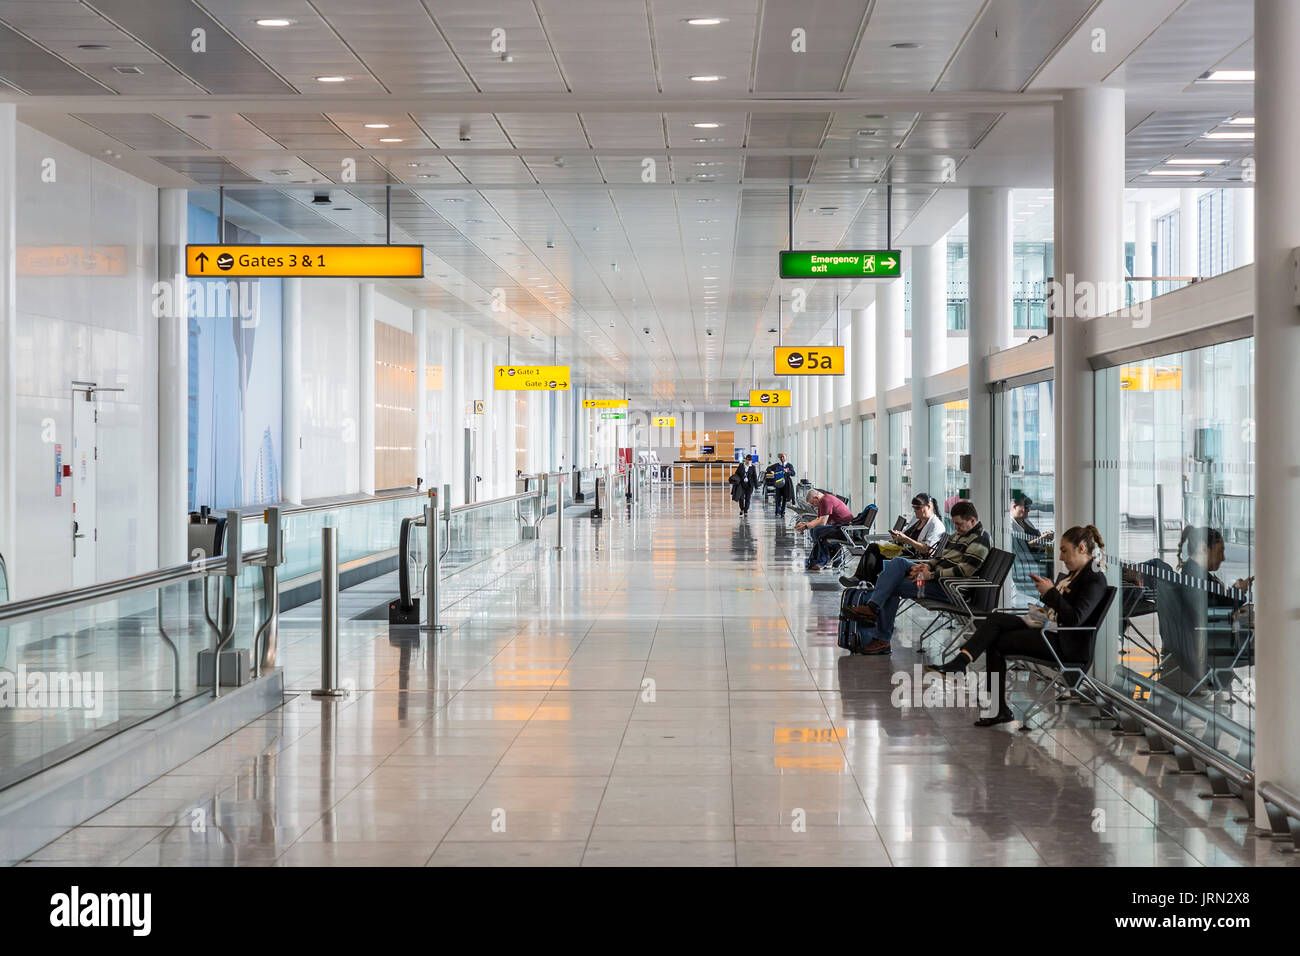 Departure gates, Heathrow terminal 5, London, UK - Stock Image